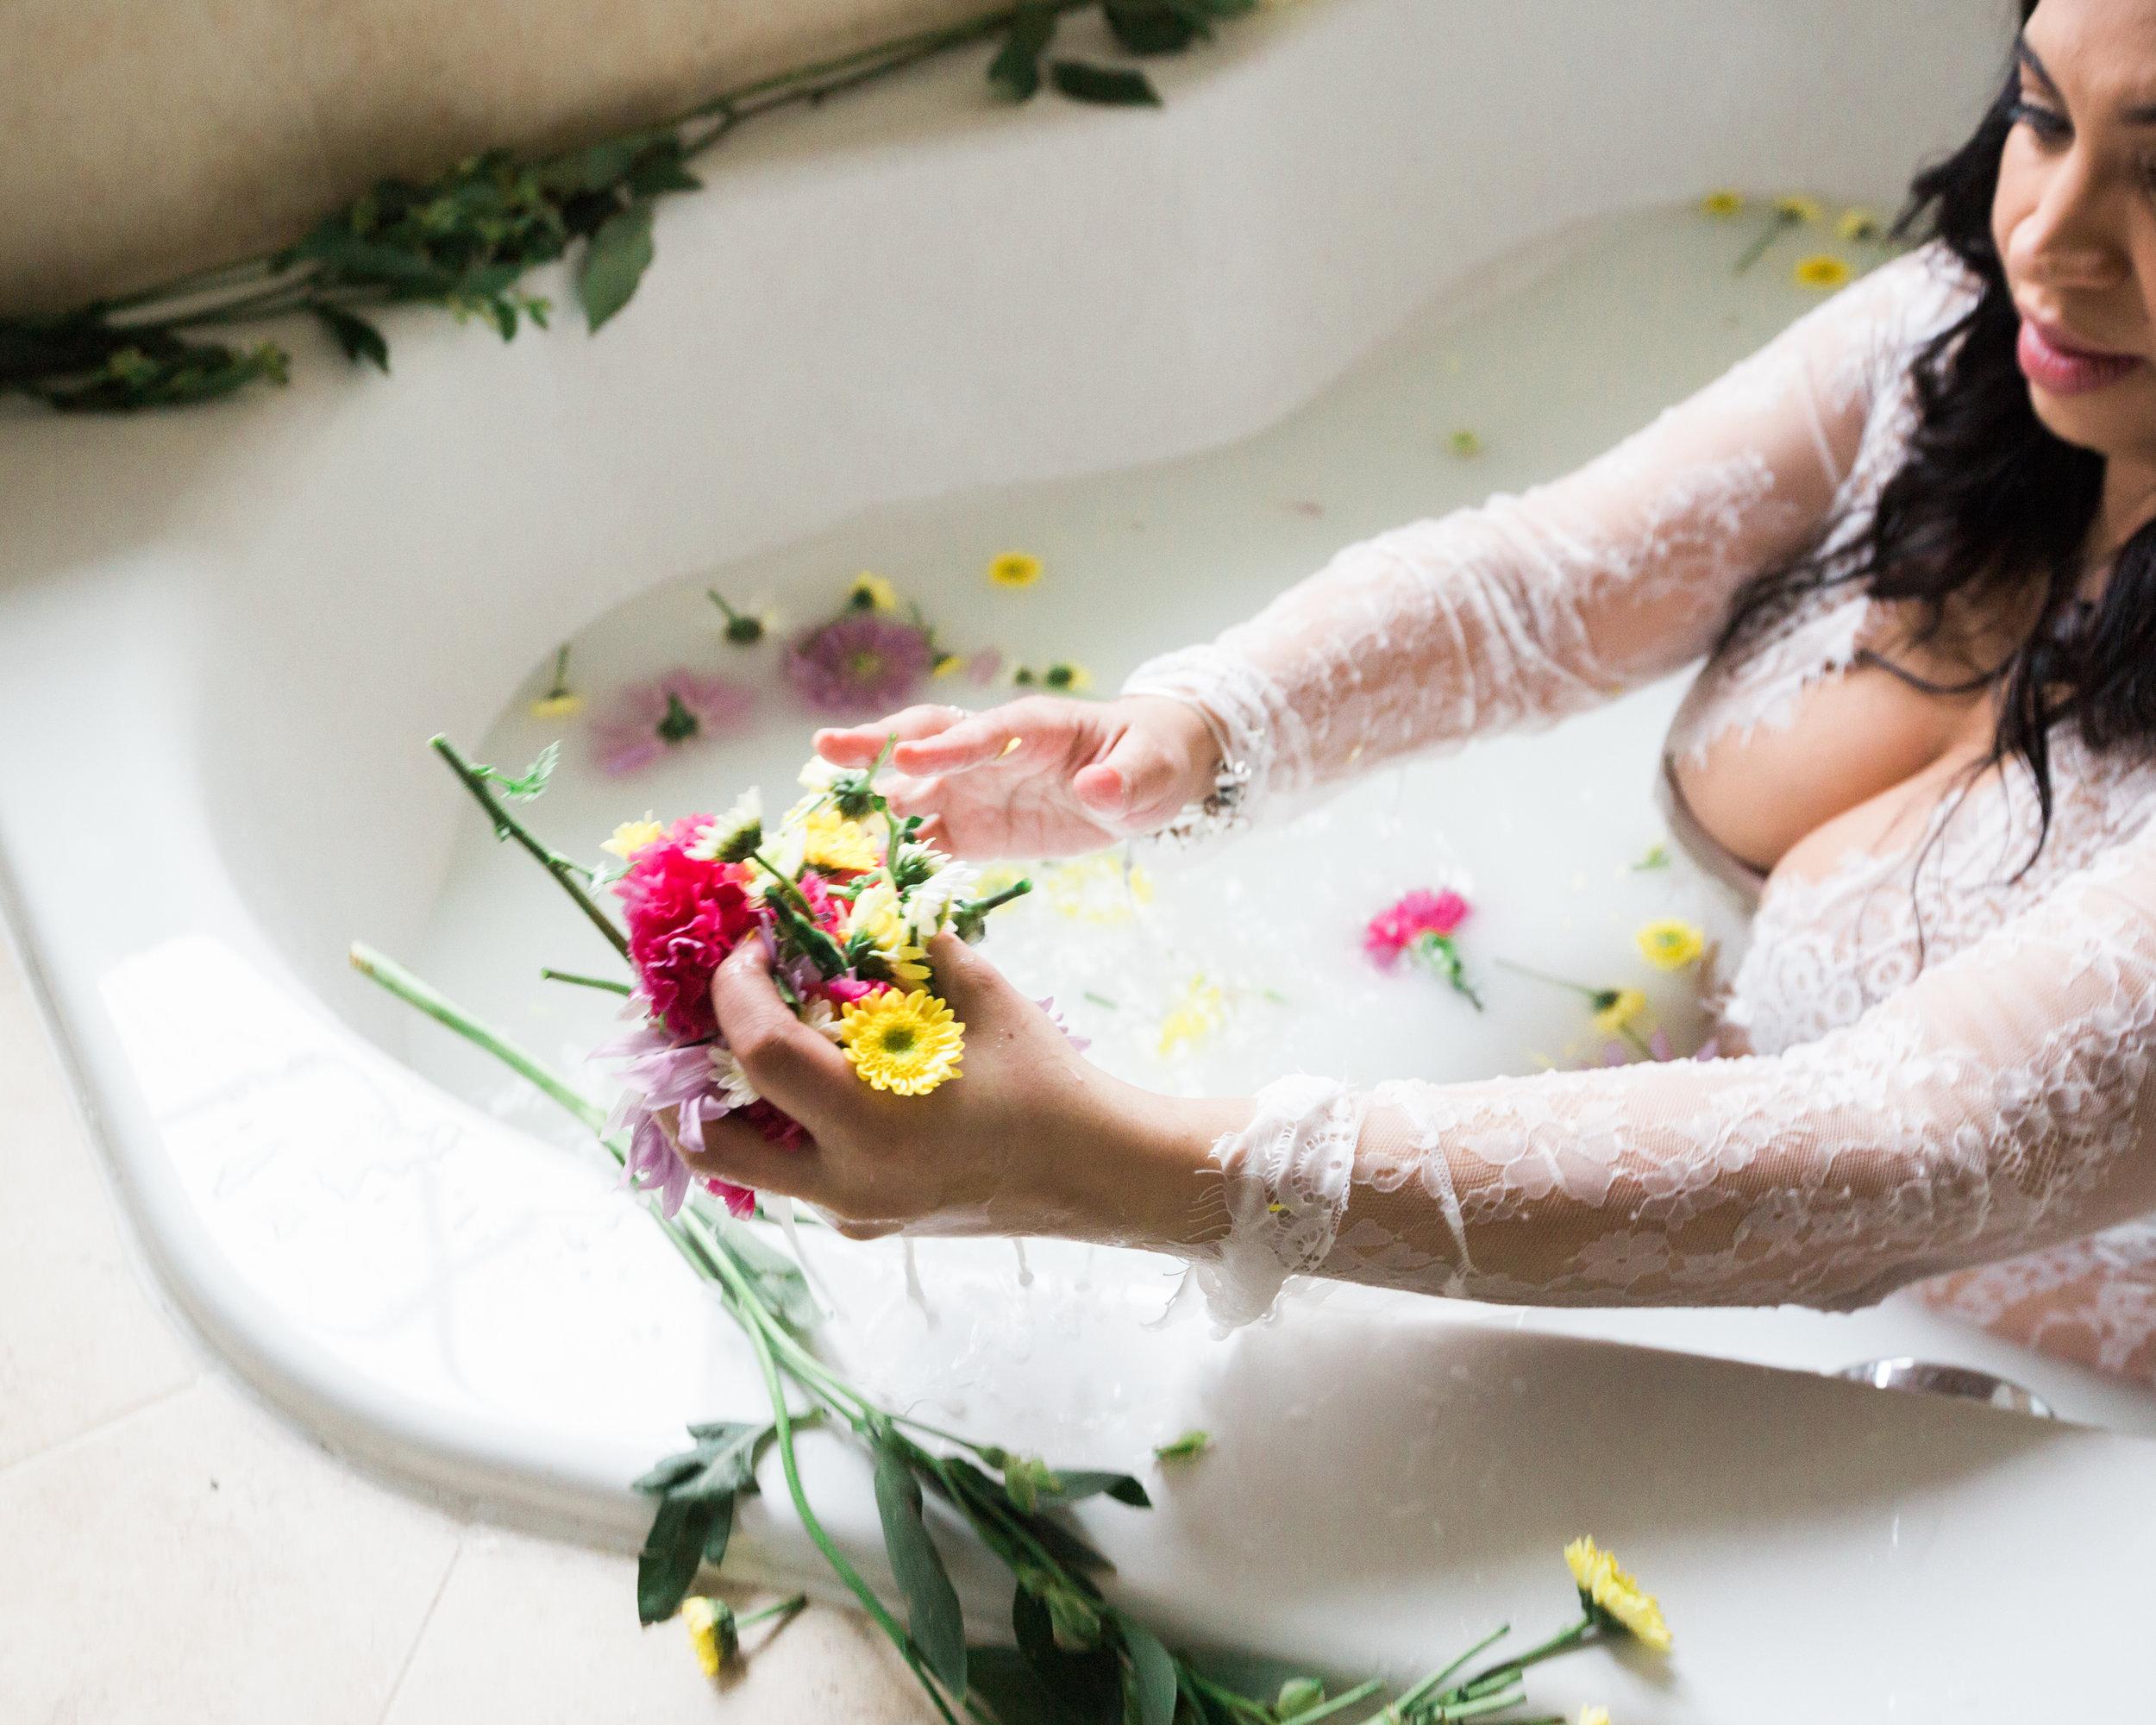 Best Ingredients for a Milk Bath Baltimore Black Mom Maternity Photographer Megapixels Media Photography-5.jpg